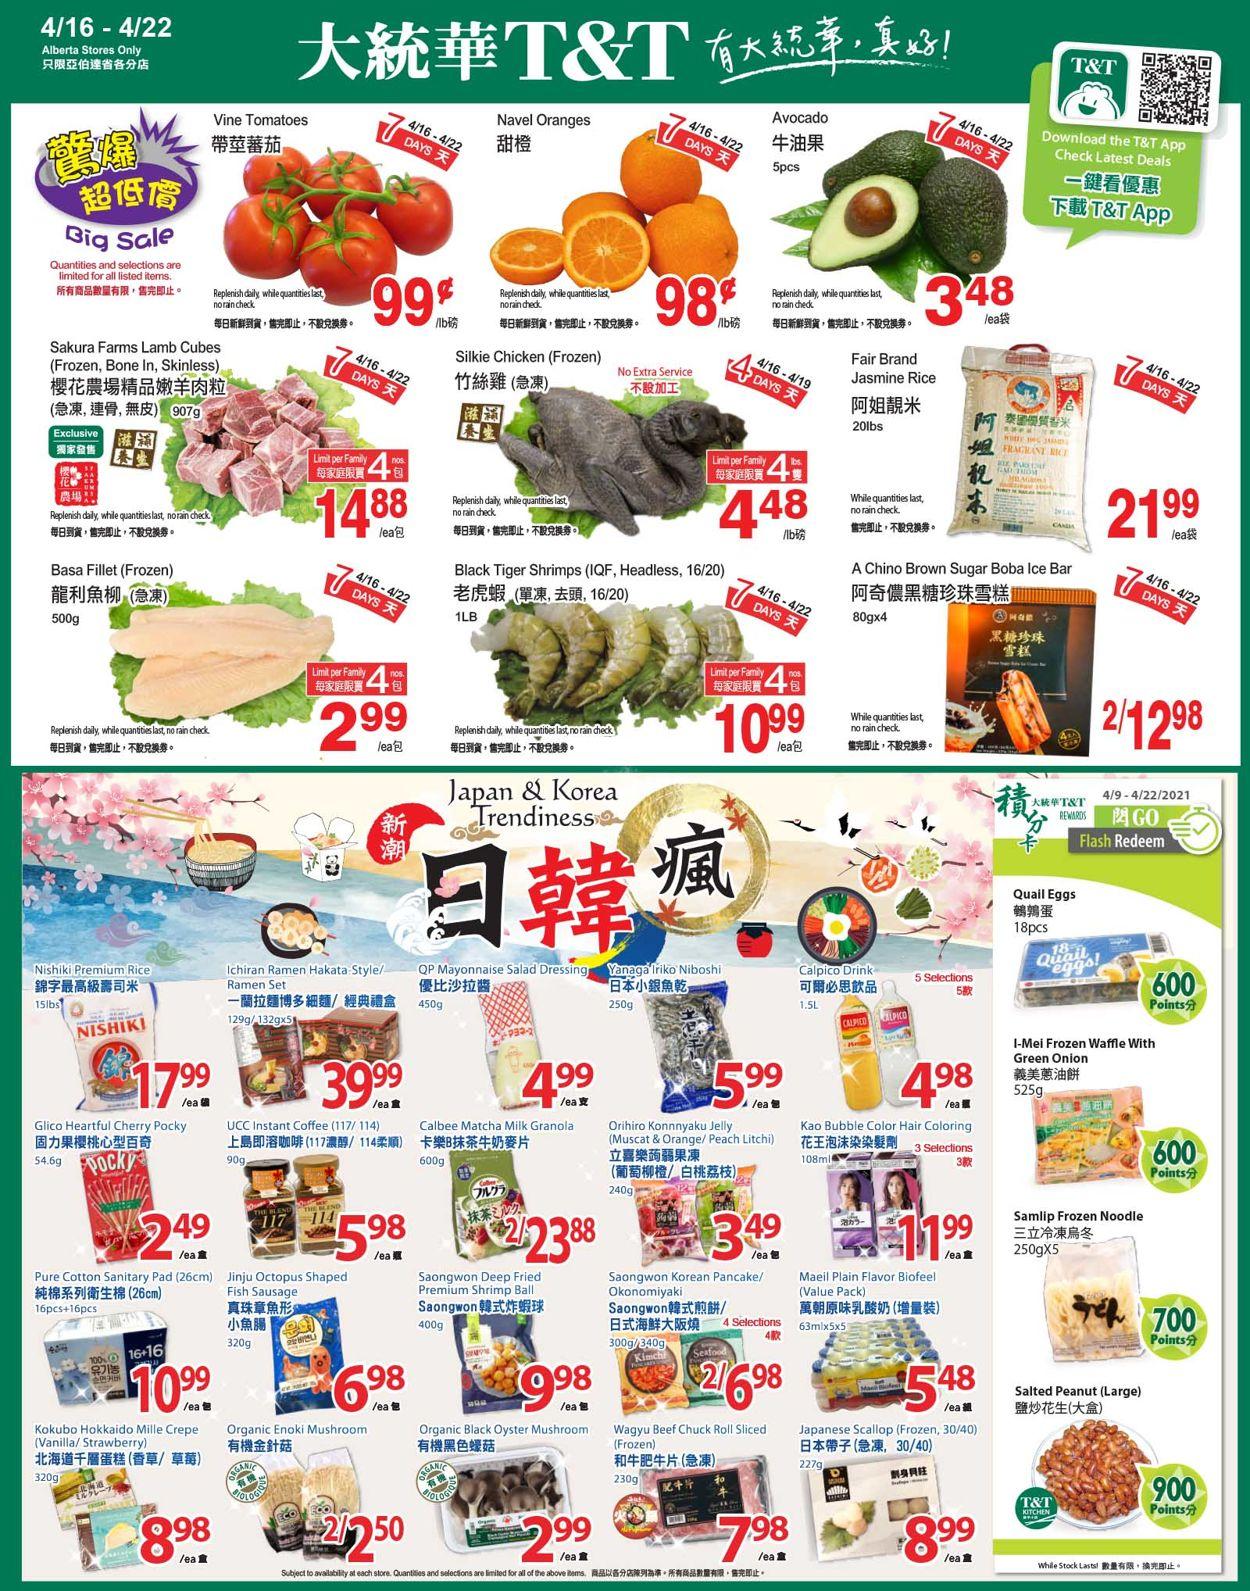 T&T Supermarket - Alberta Flyer - 04/16-04/22/2021